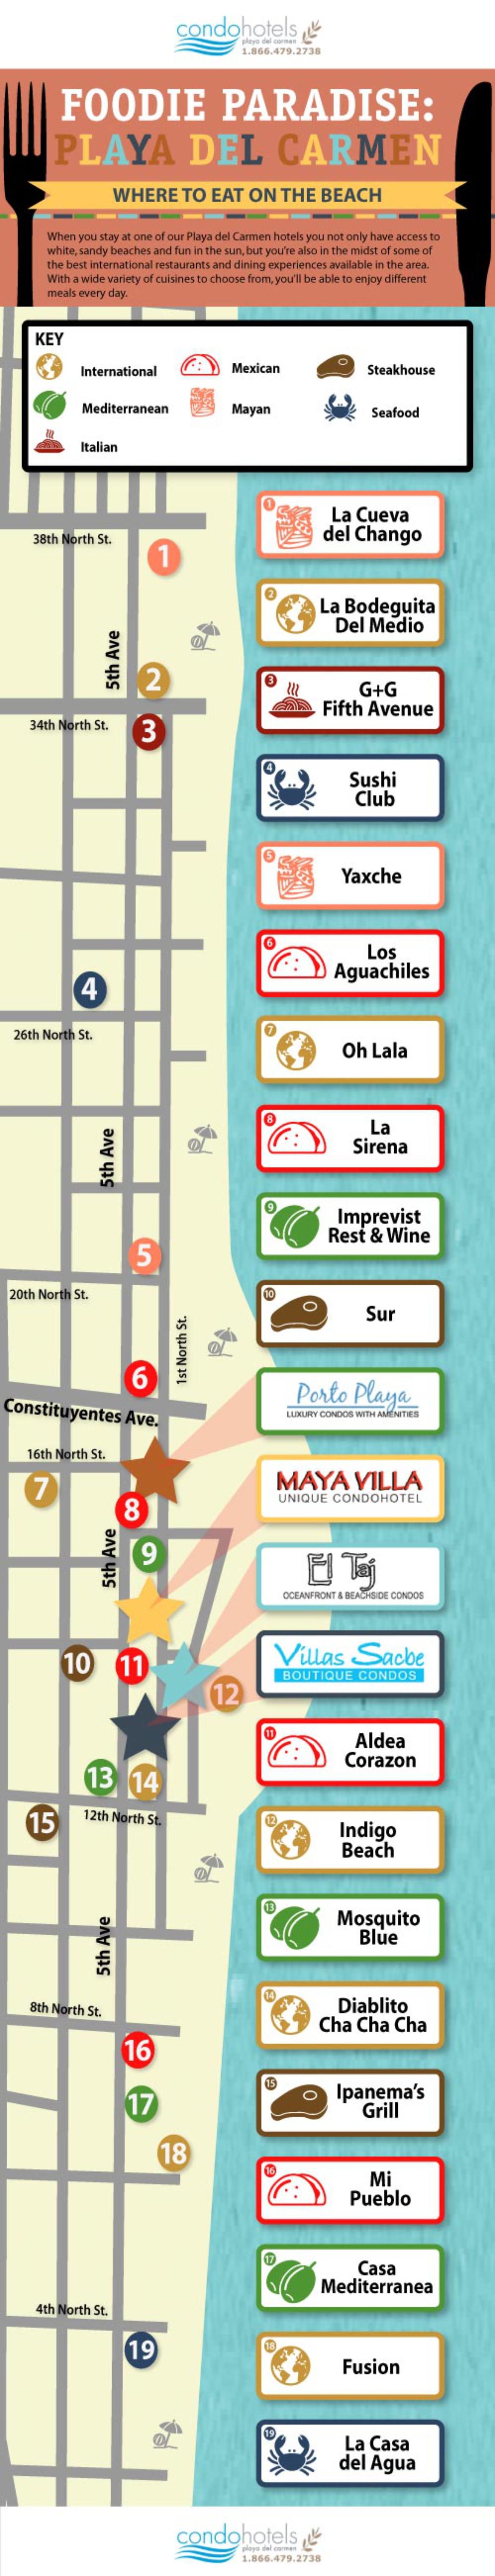 restaurants-in-playa-del-carmen